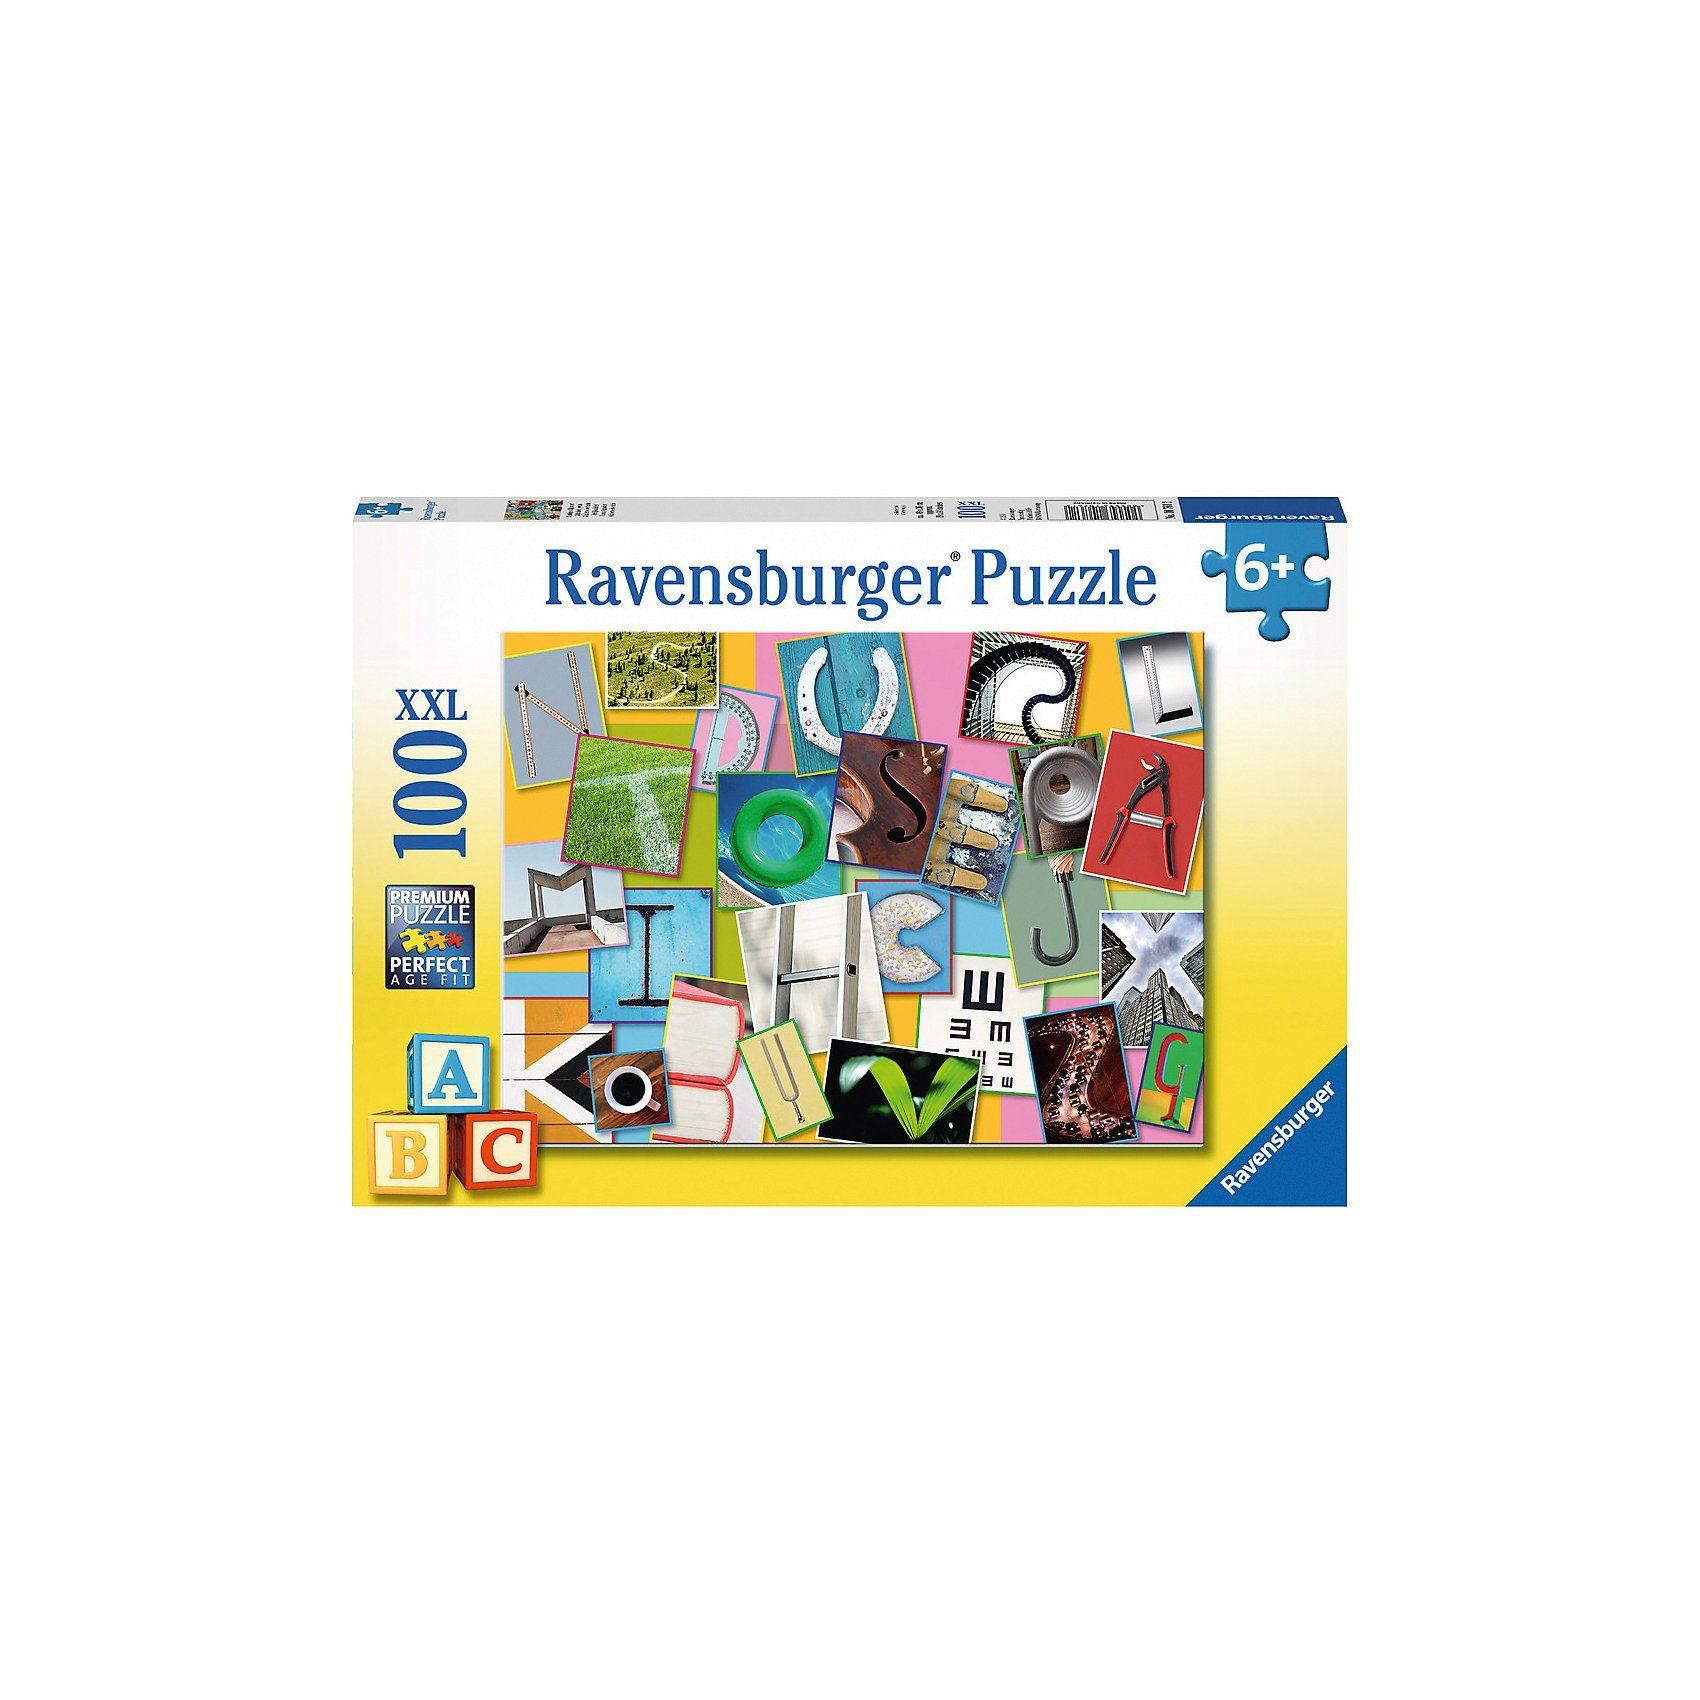 Ravensburger Puzzle 100 Teile Lustiges Alphabet